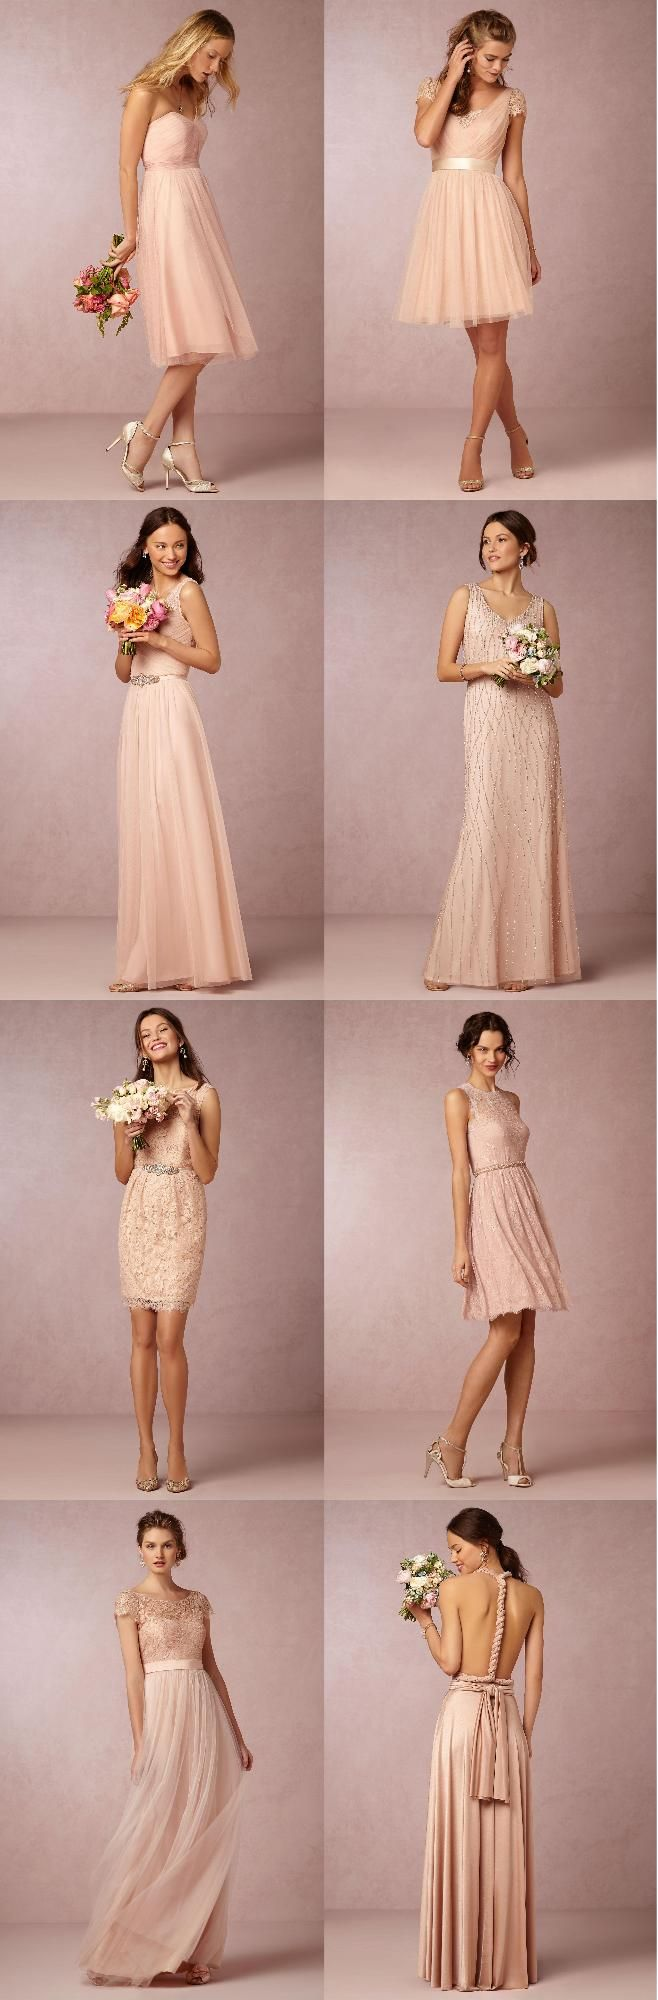 8 Pretty in Light Pink Bridesmaid Dresses   Damas, Damitas de honor ...